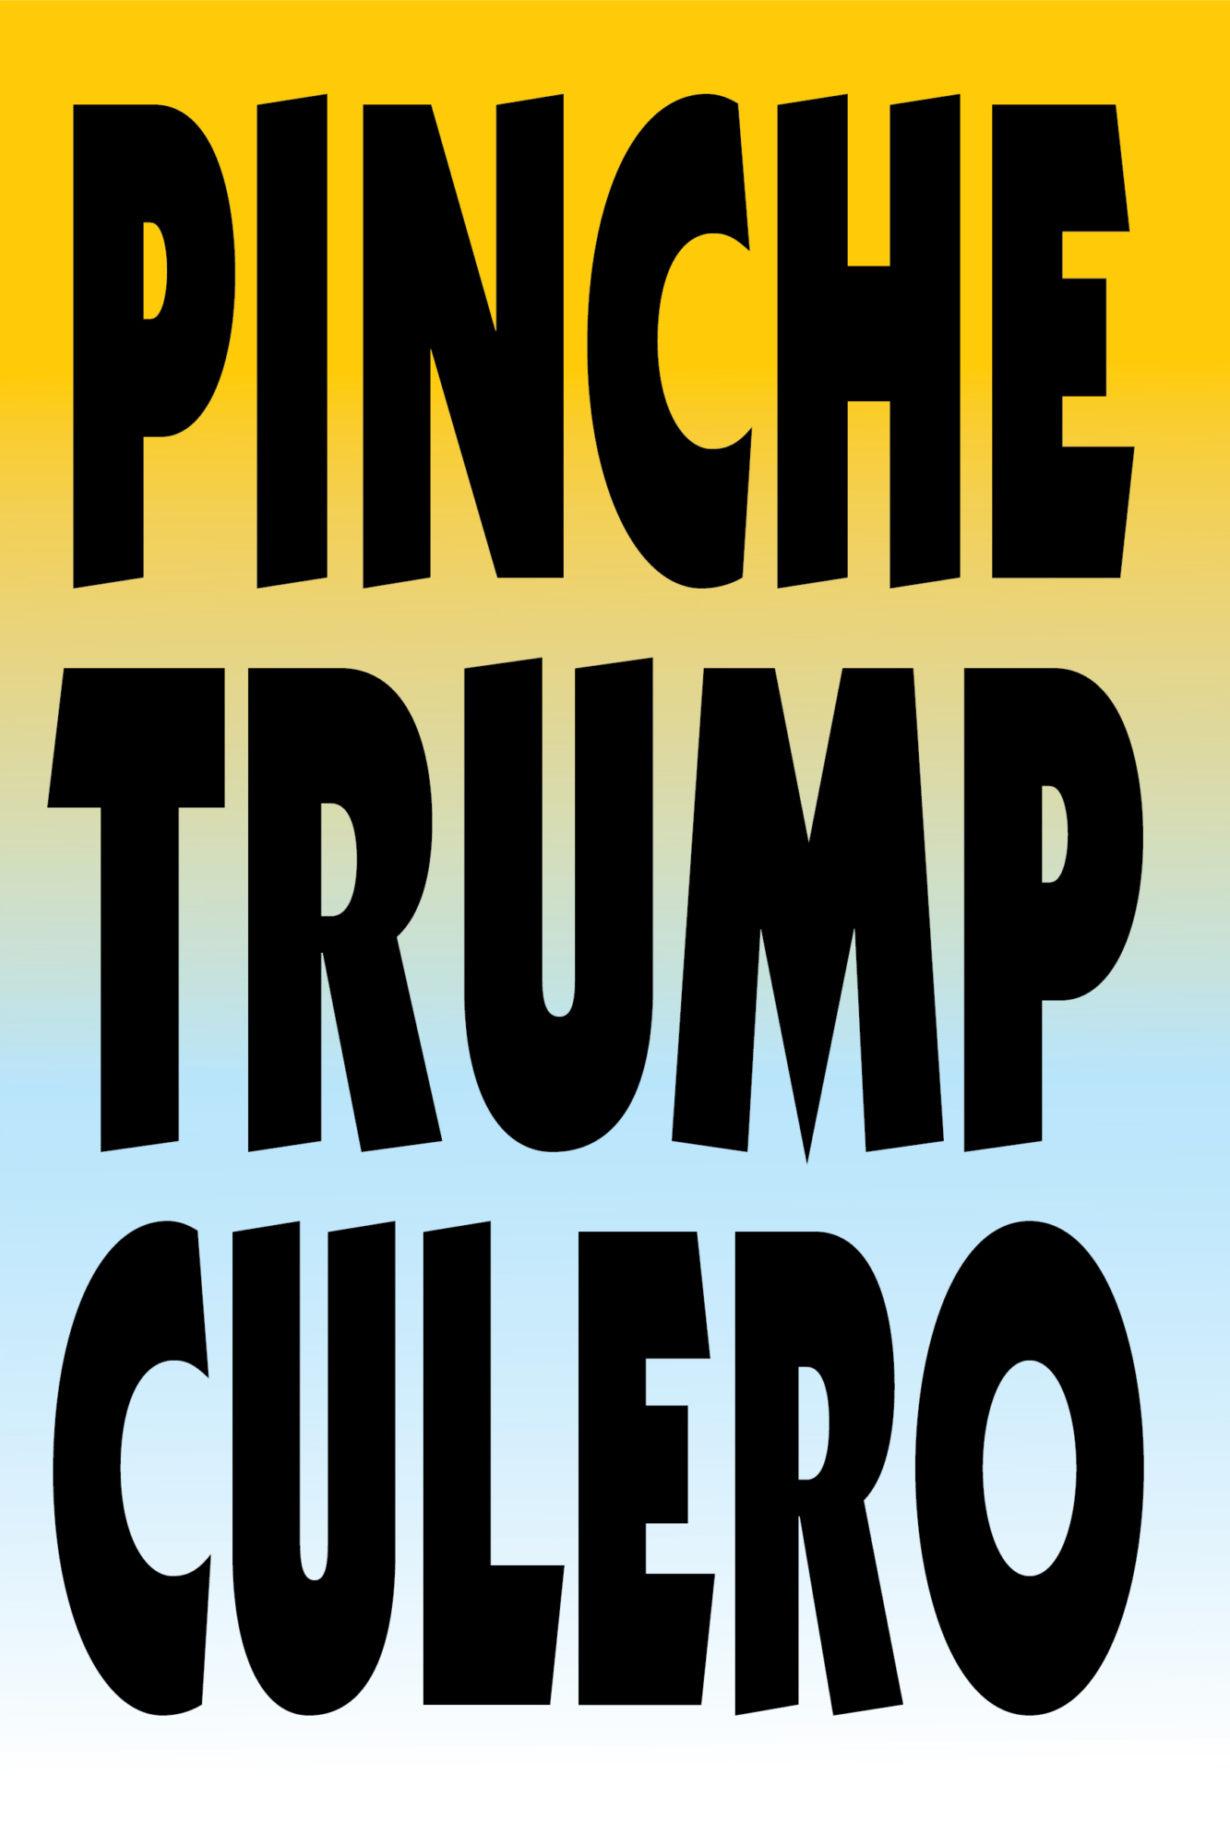 NP_01_25_2017_Pinche-Trump-Culero.jpg